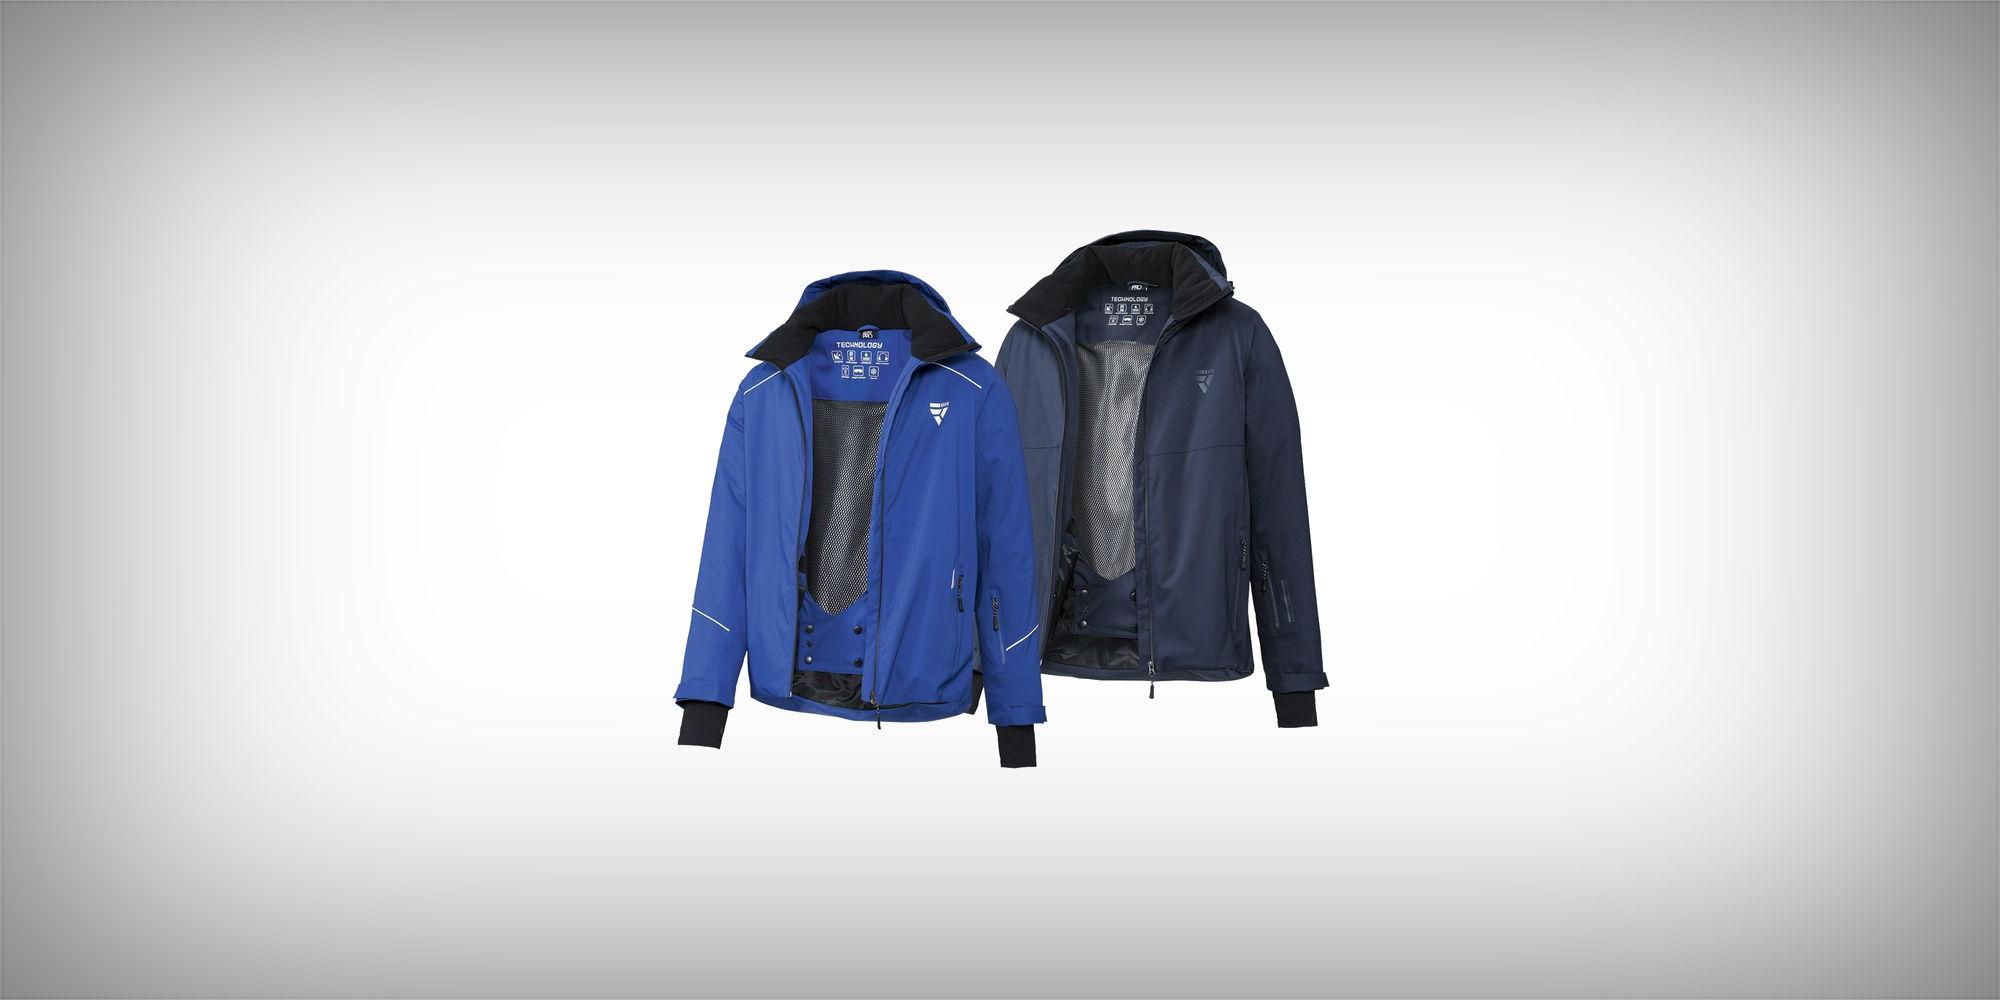 CRIVIT®PRO Dames ski jas (42, Witgrijszwart) | LIDL